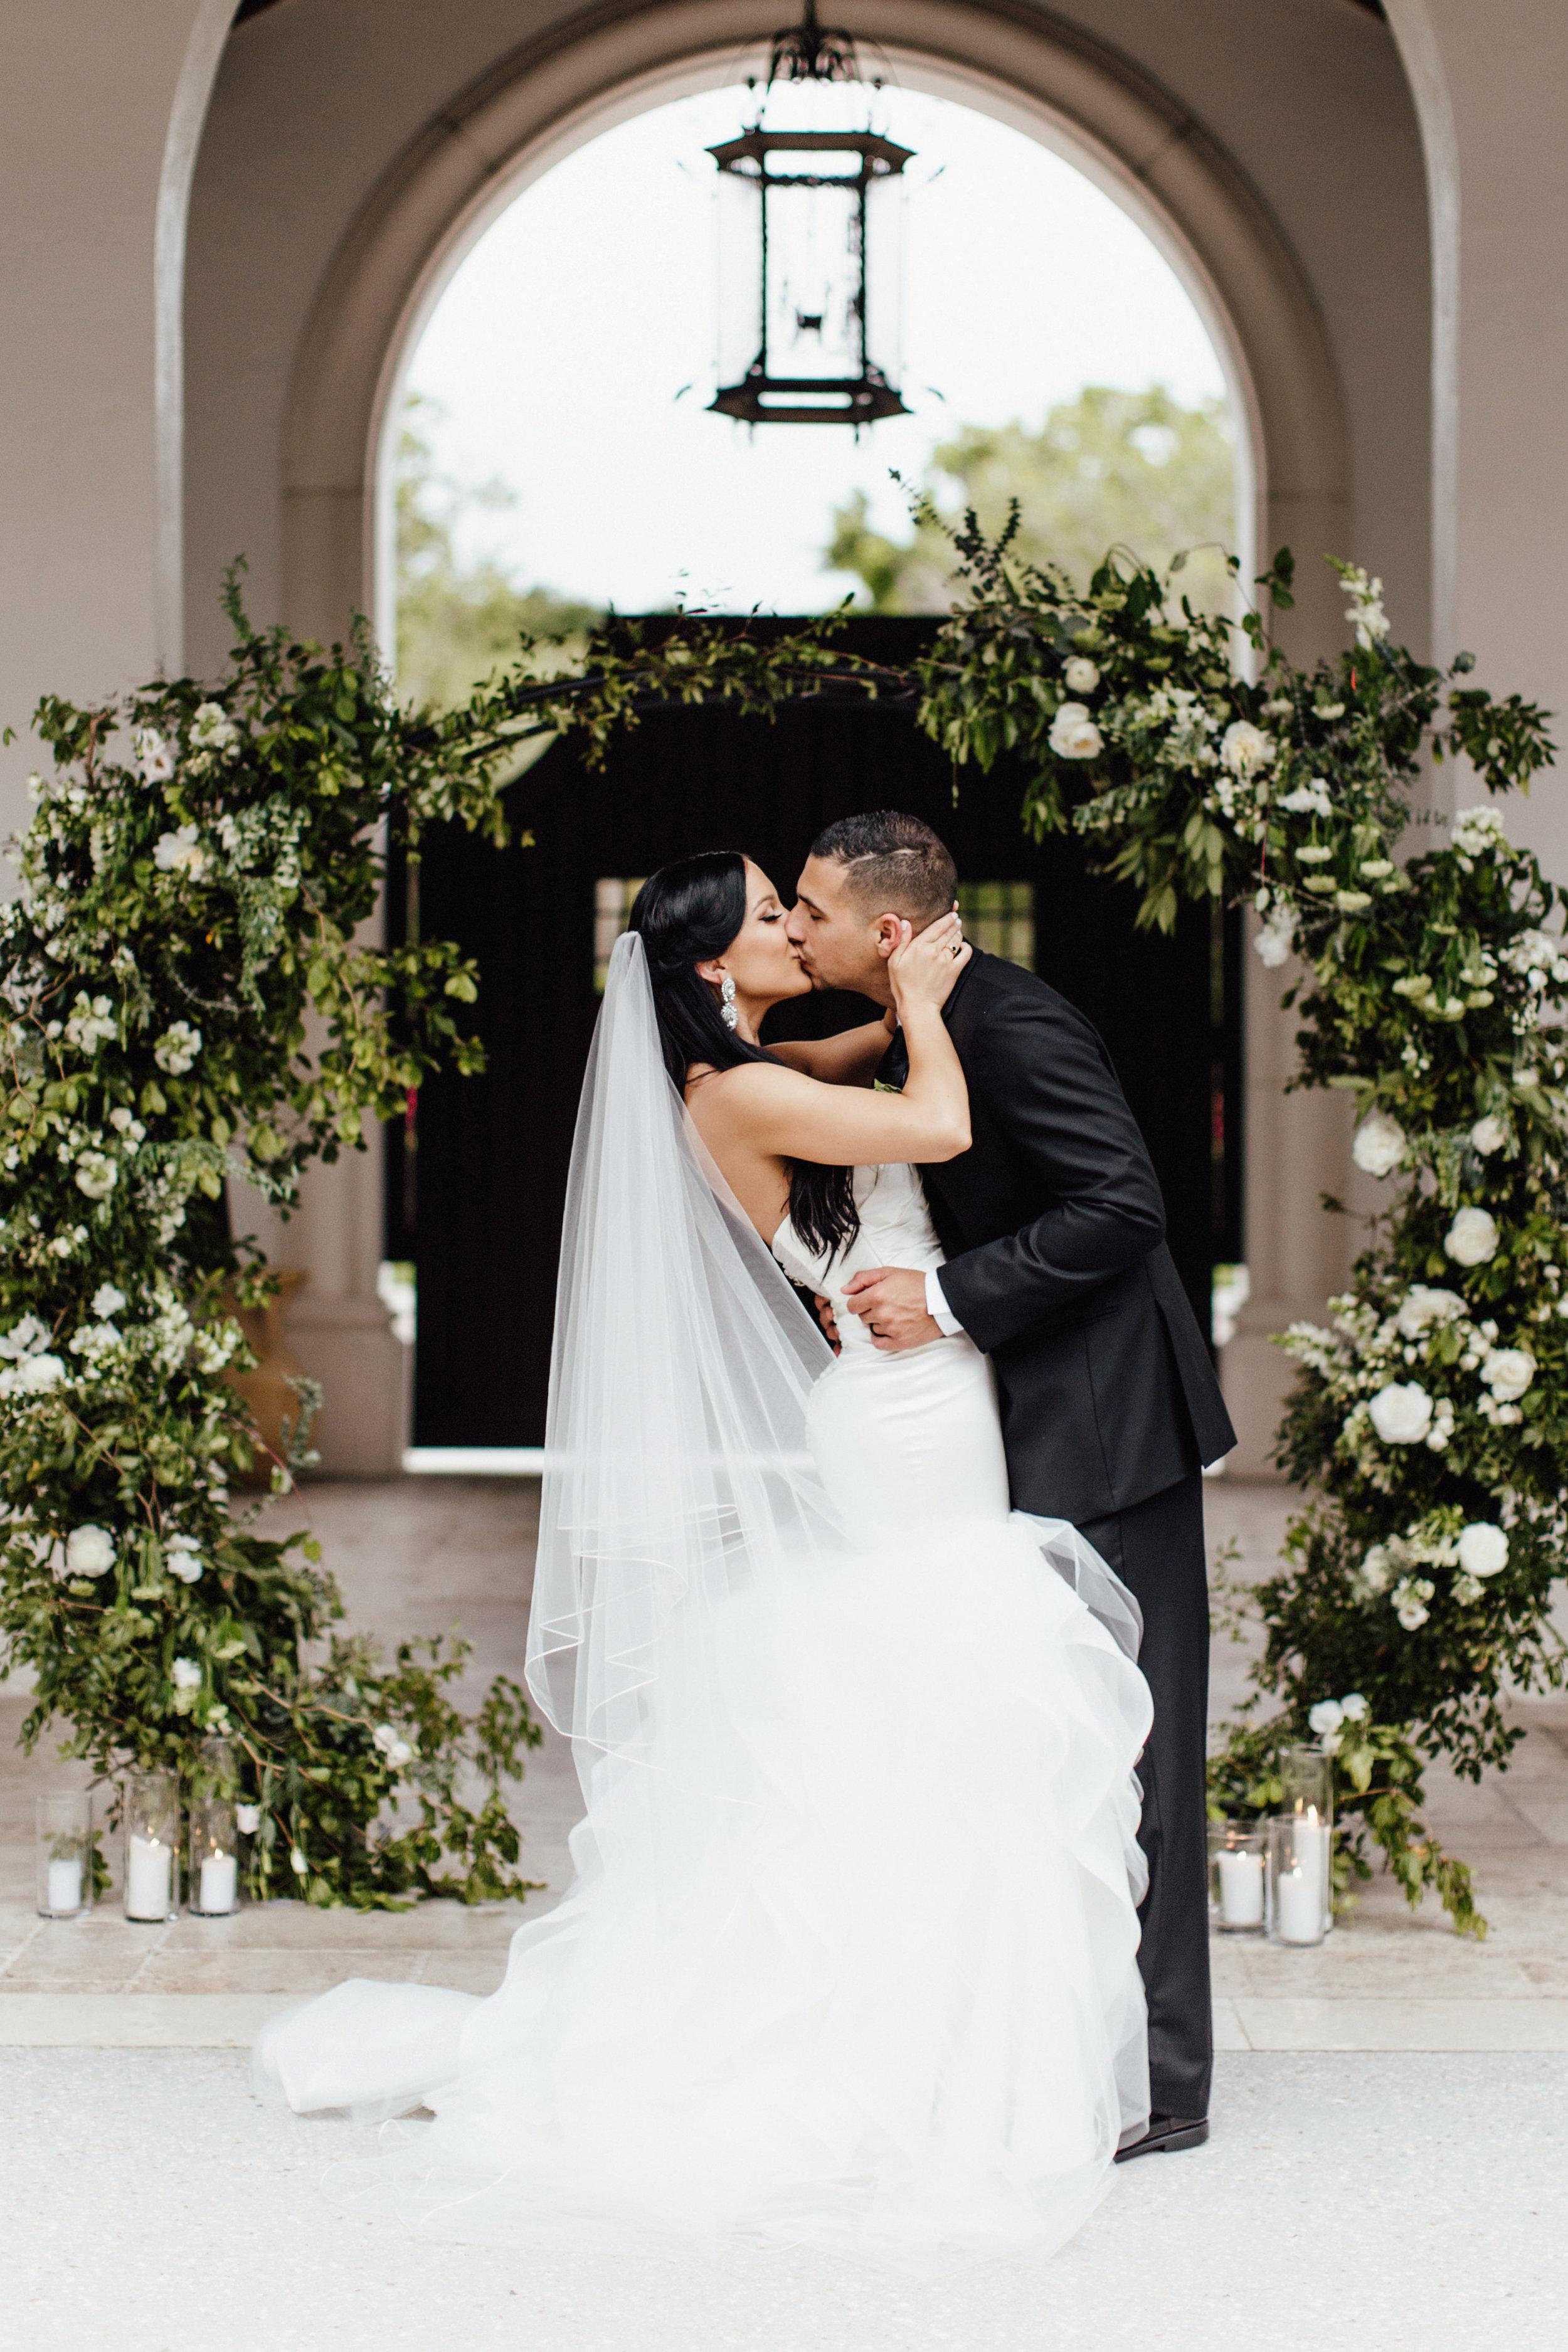 Lauren & Gio's Wedding | Miromar Lakes Florida